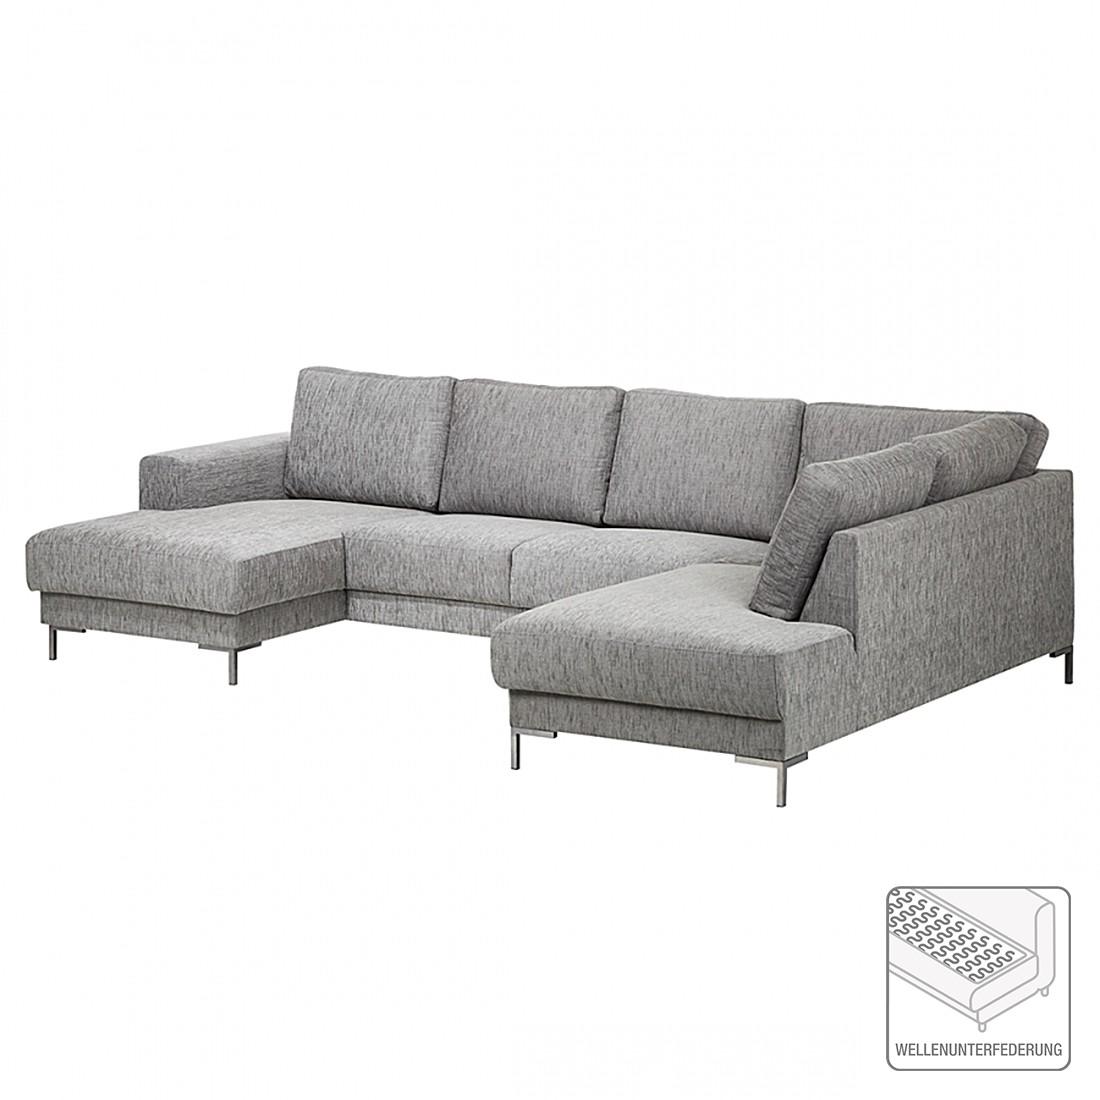 moderne wohnzimmer ideen grau geschickt kombinieren wohnlandschaften wohnideen. Black Bedroom Furniture Sets. Home Design Ideas